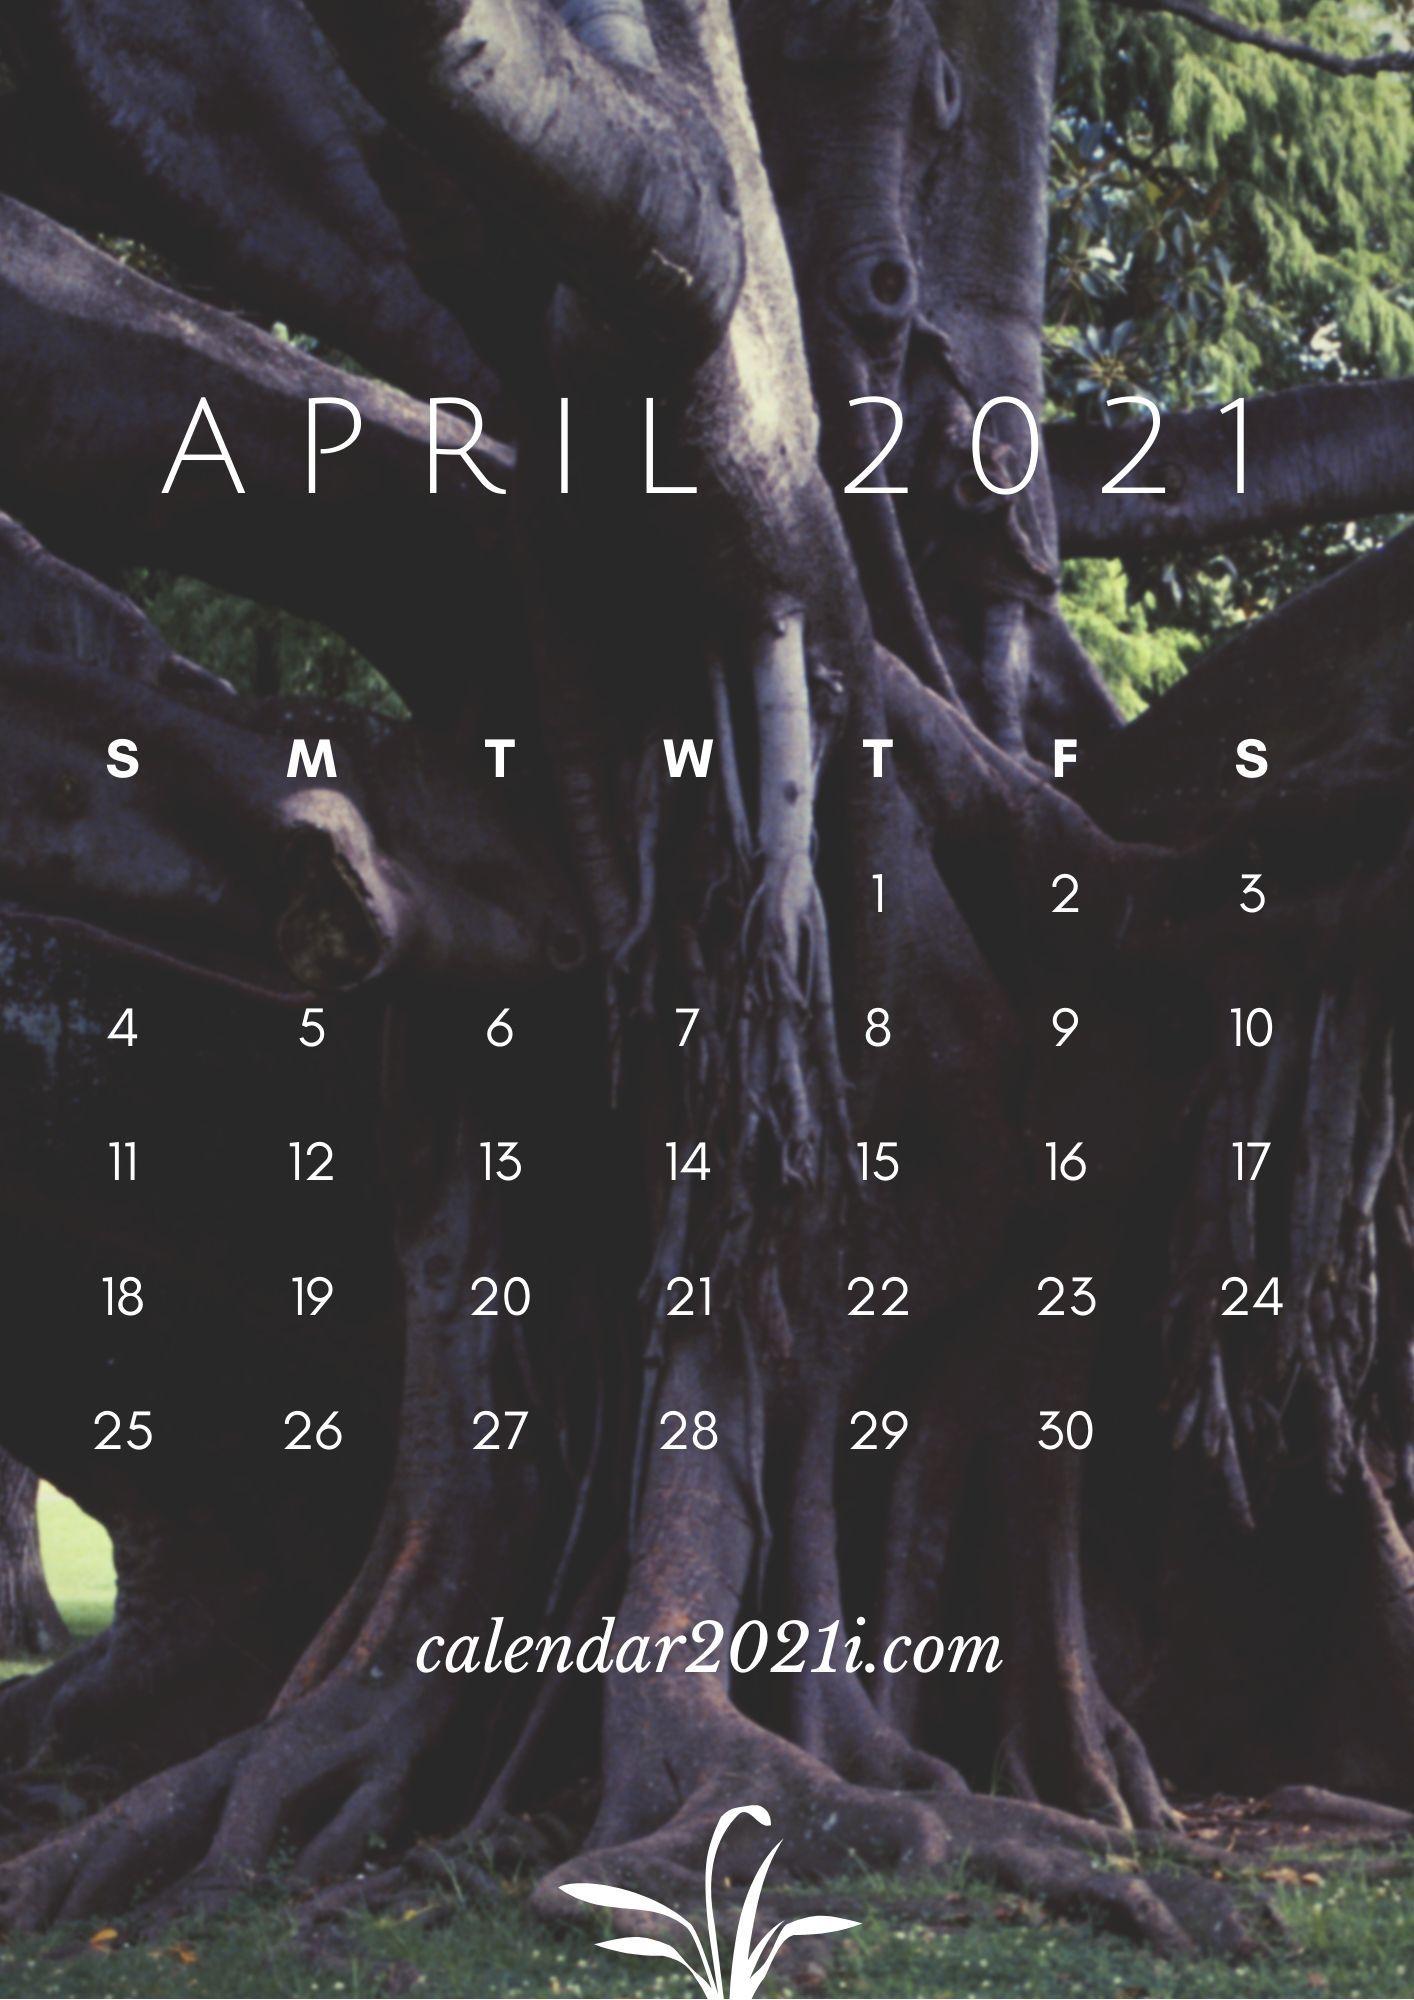 April Calendar 2021 HD Wallpaper for Apple iPhone ...